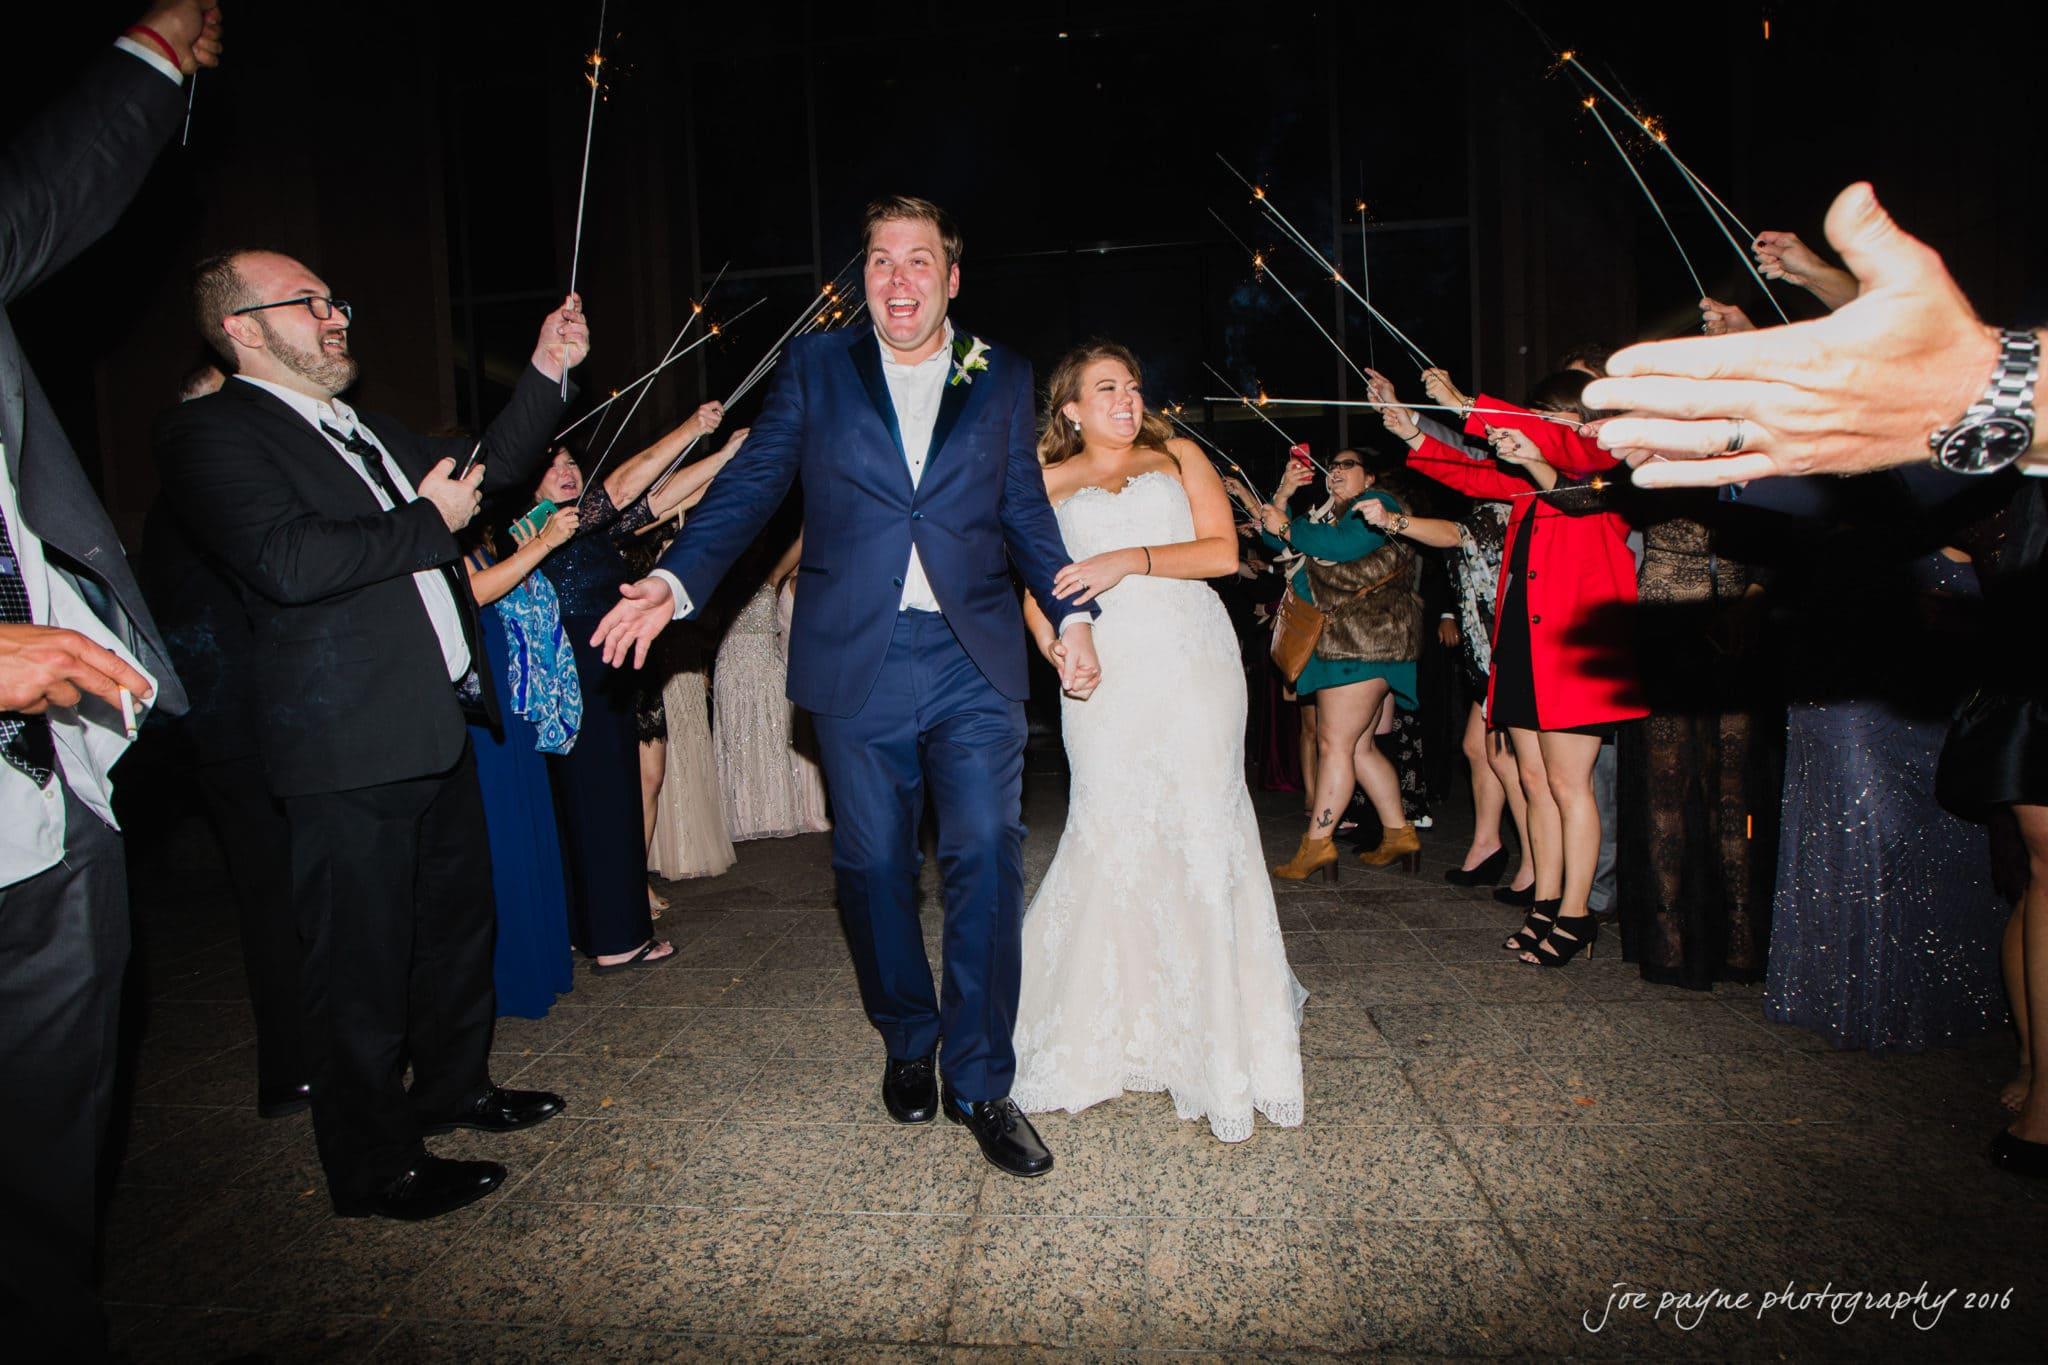 City Club Raleigh Wedding Photographer - Sparkler Exit